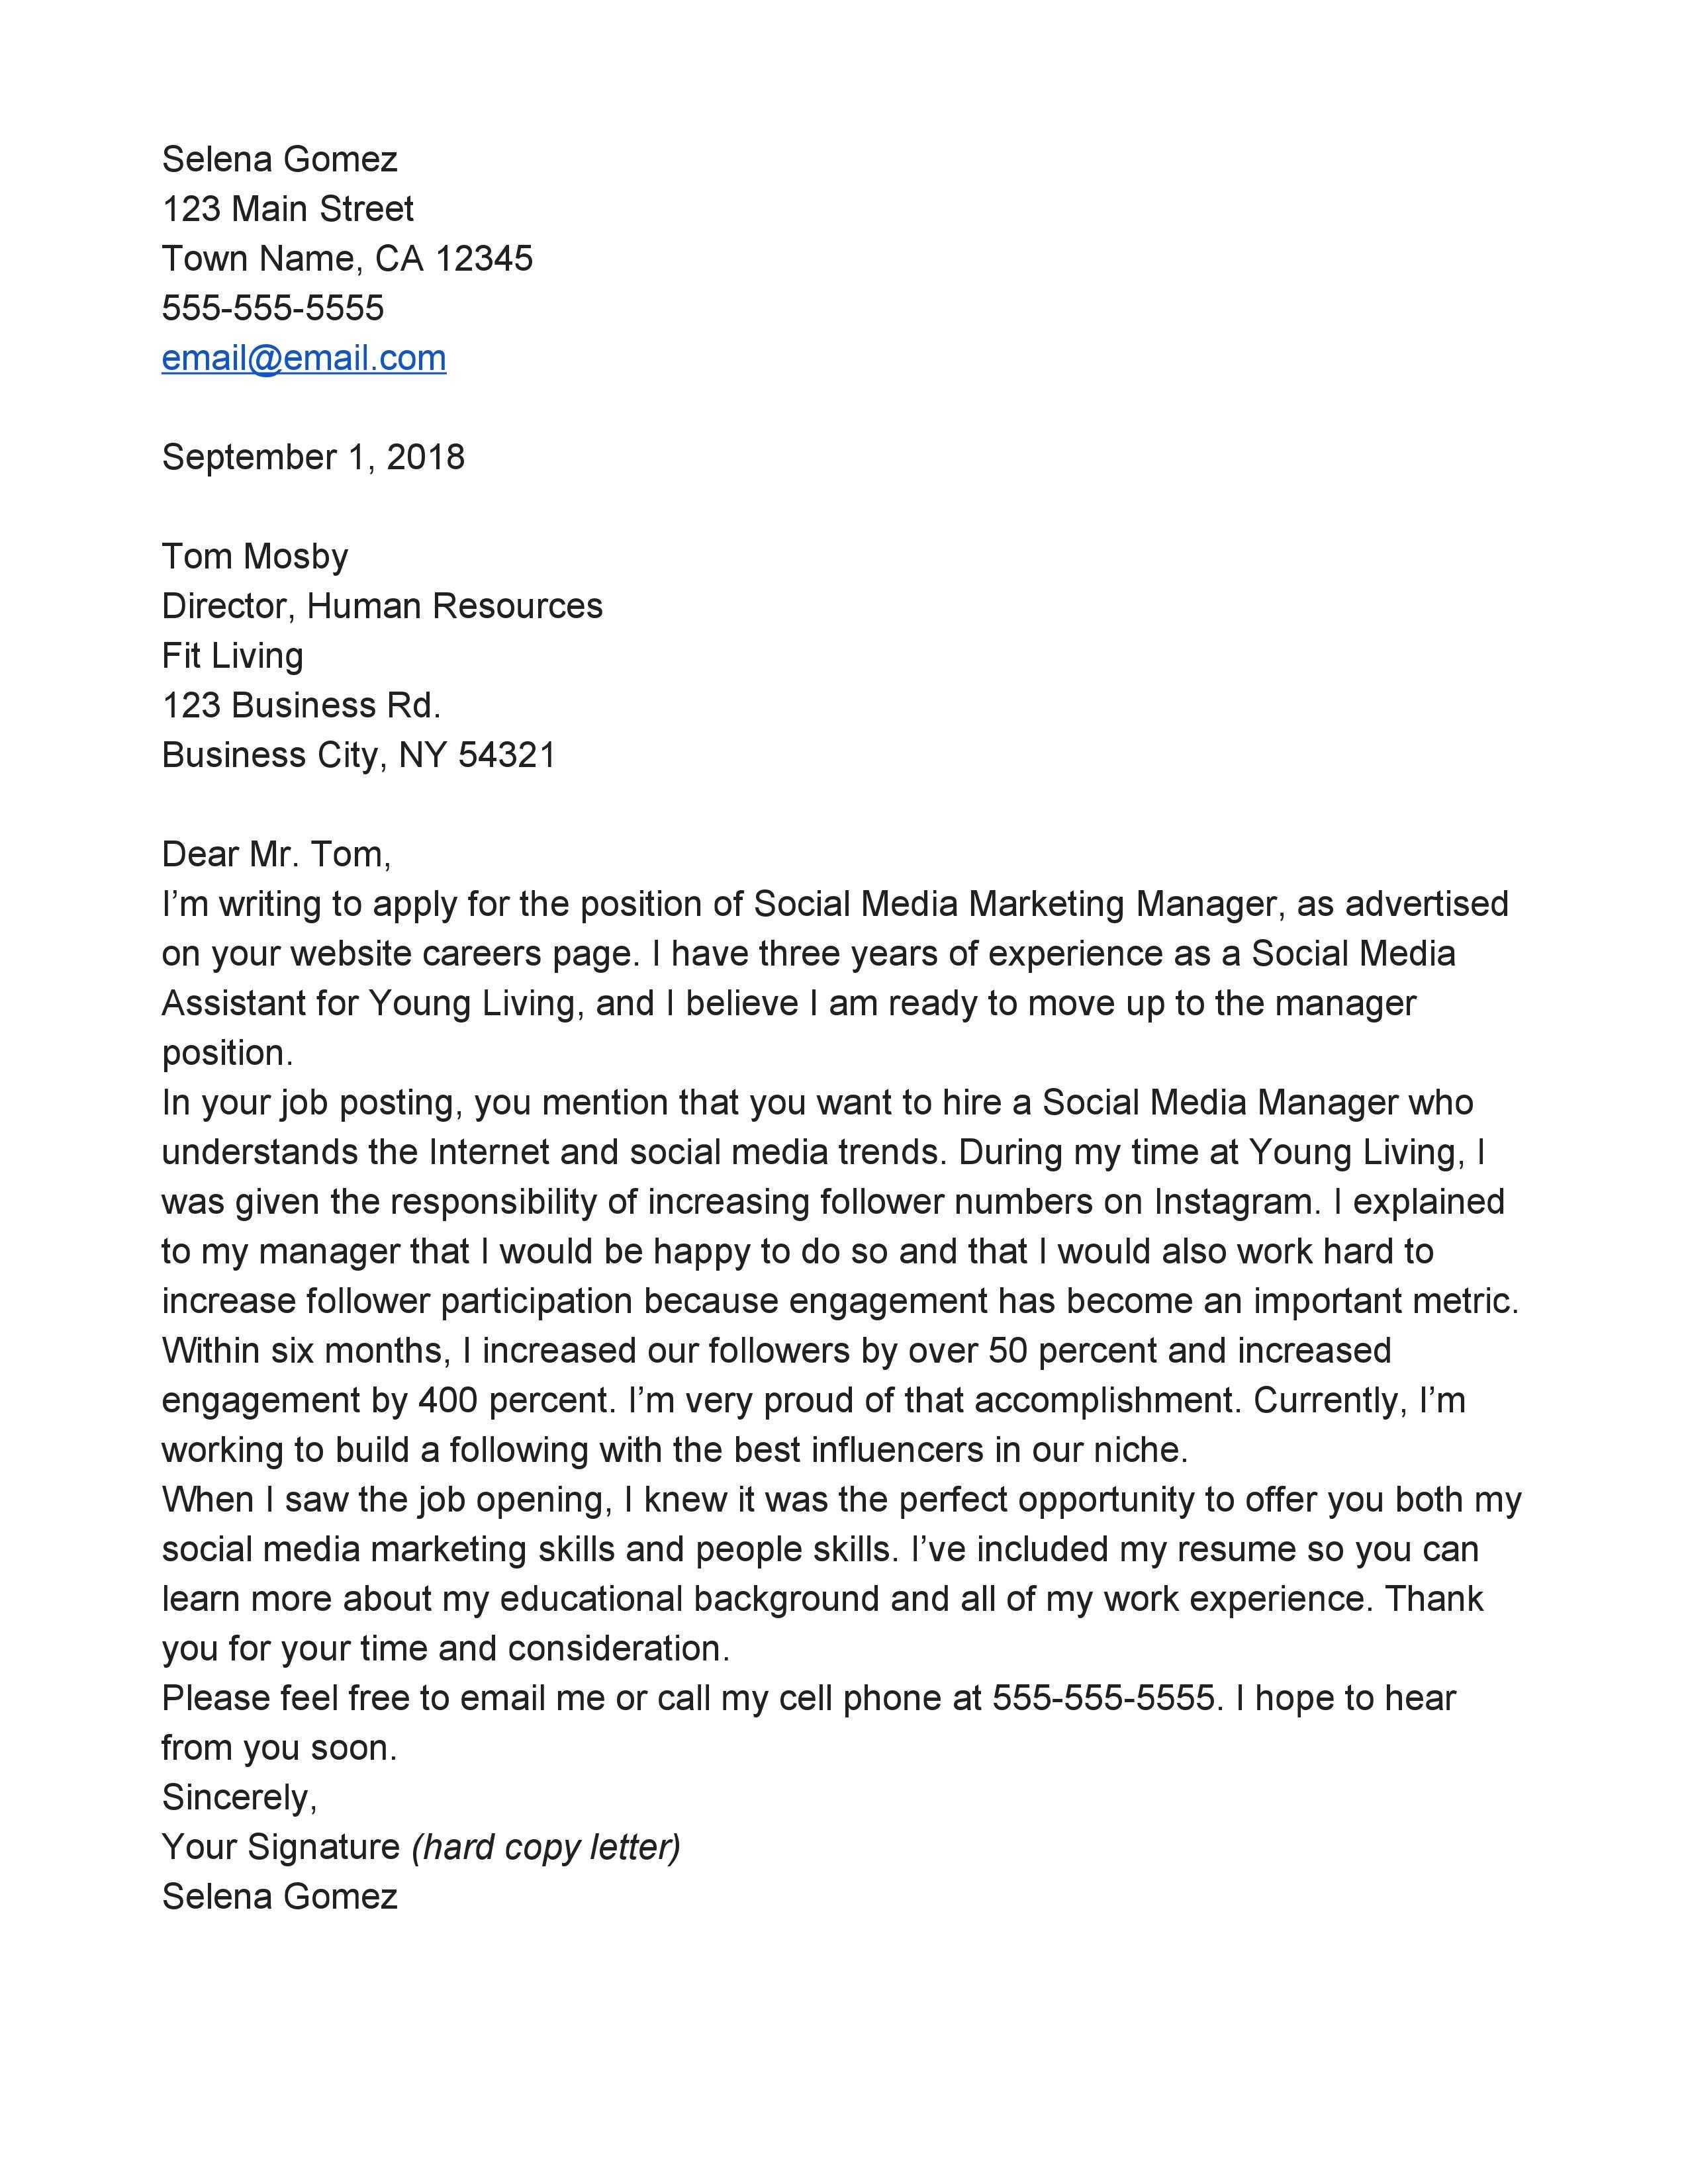 Cover Letter For Job